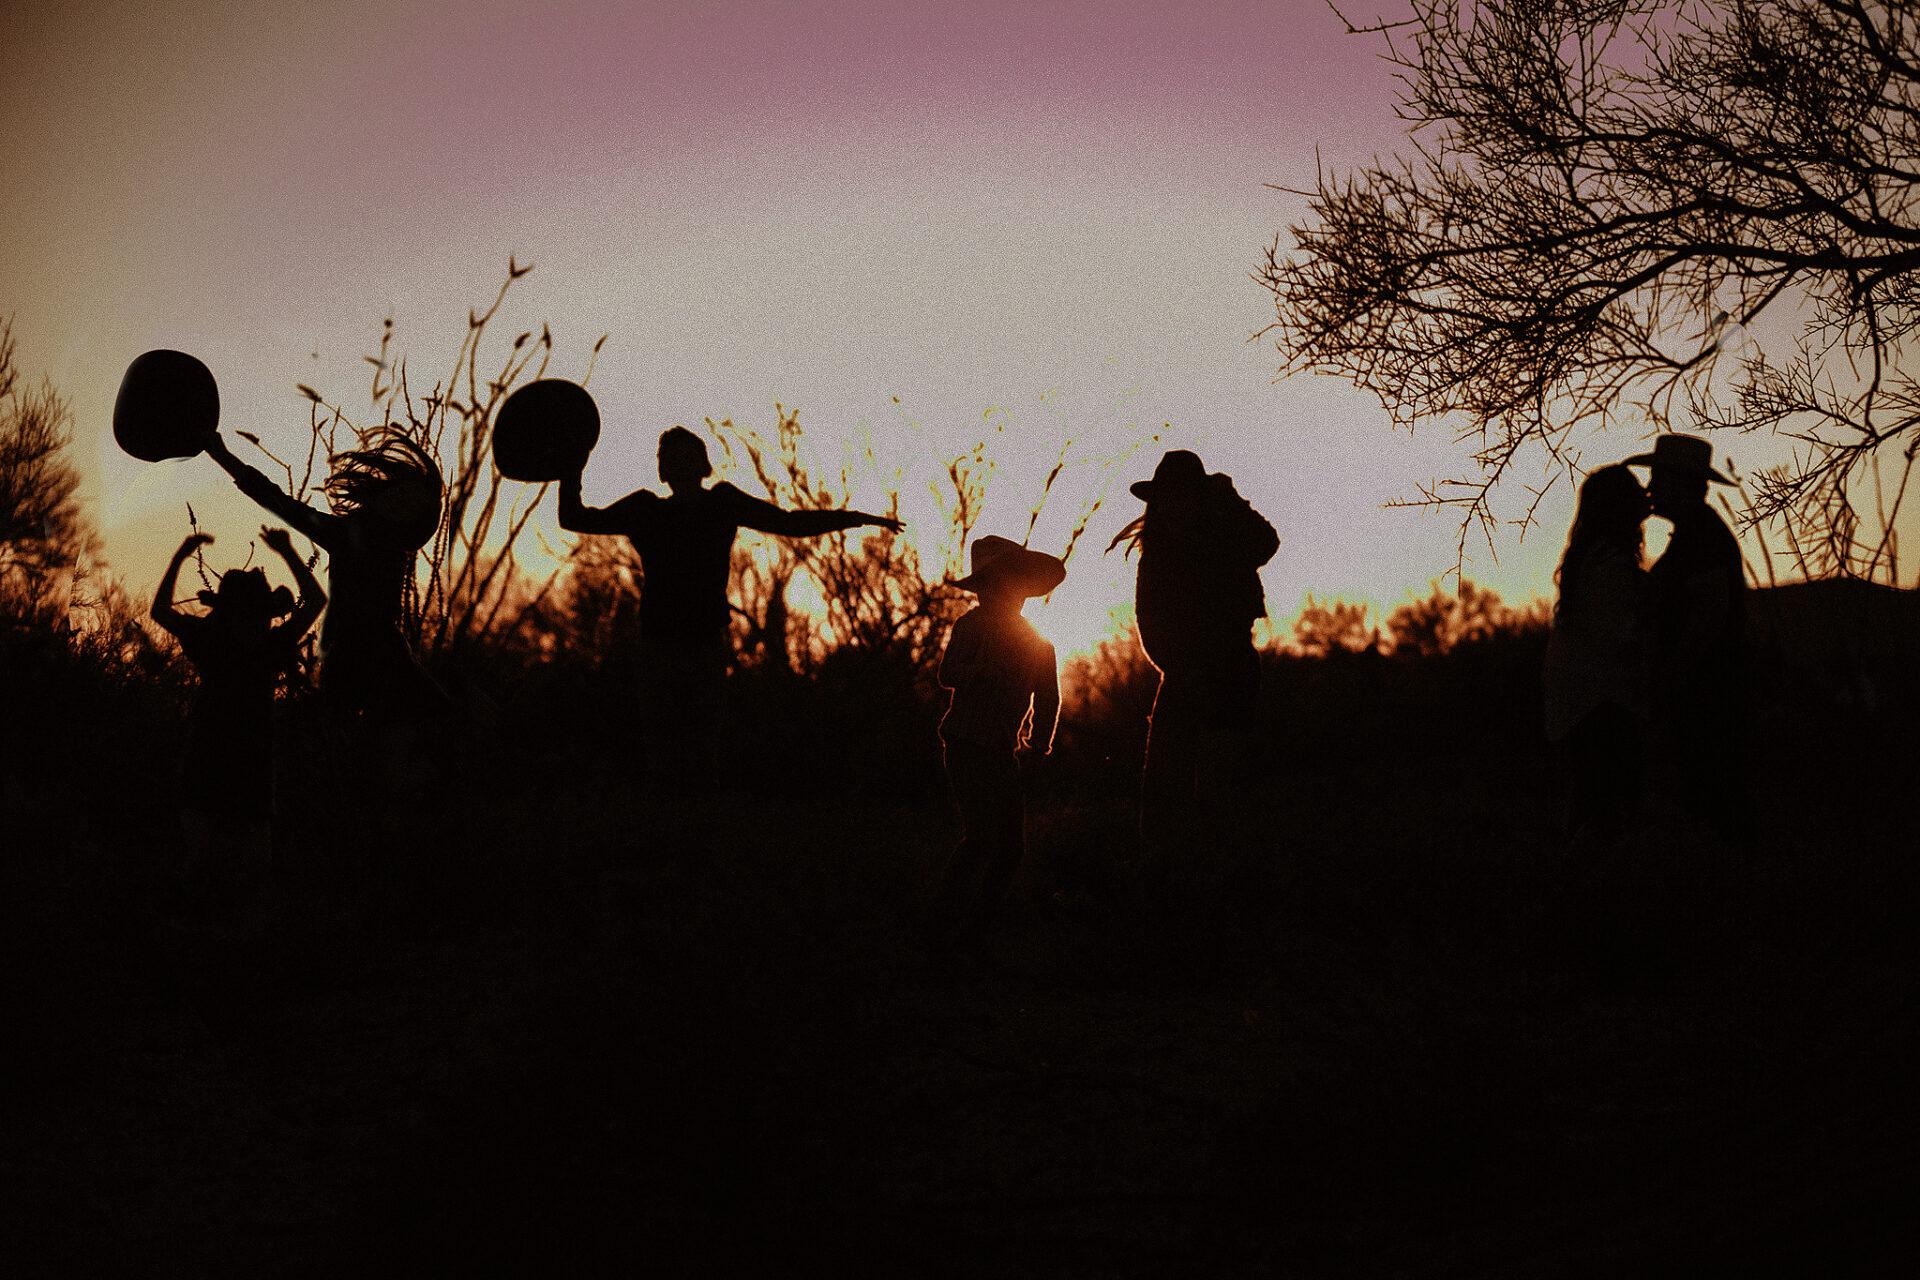 Tucson desert sunset pictures